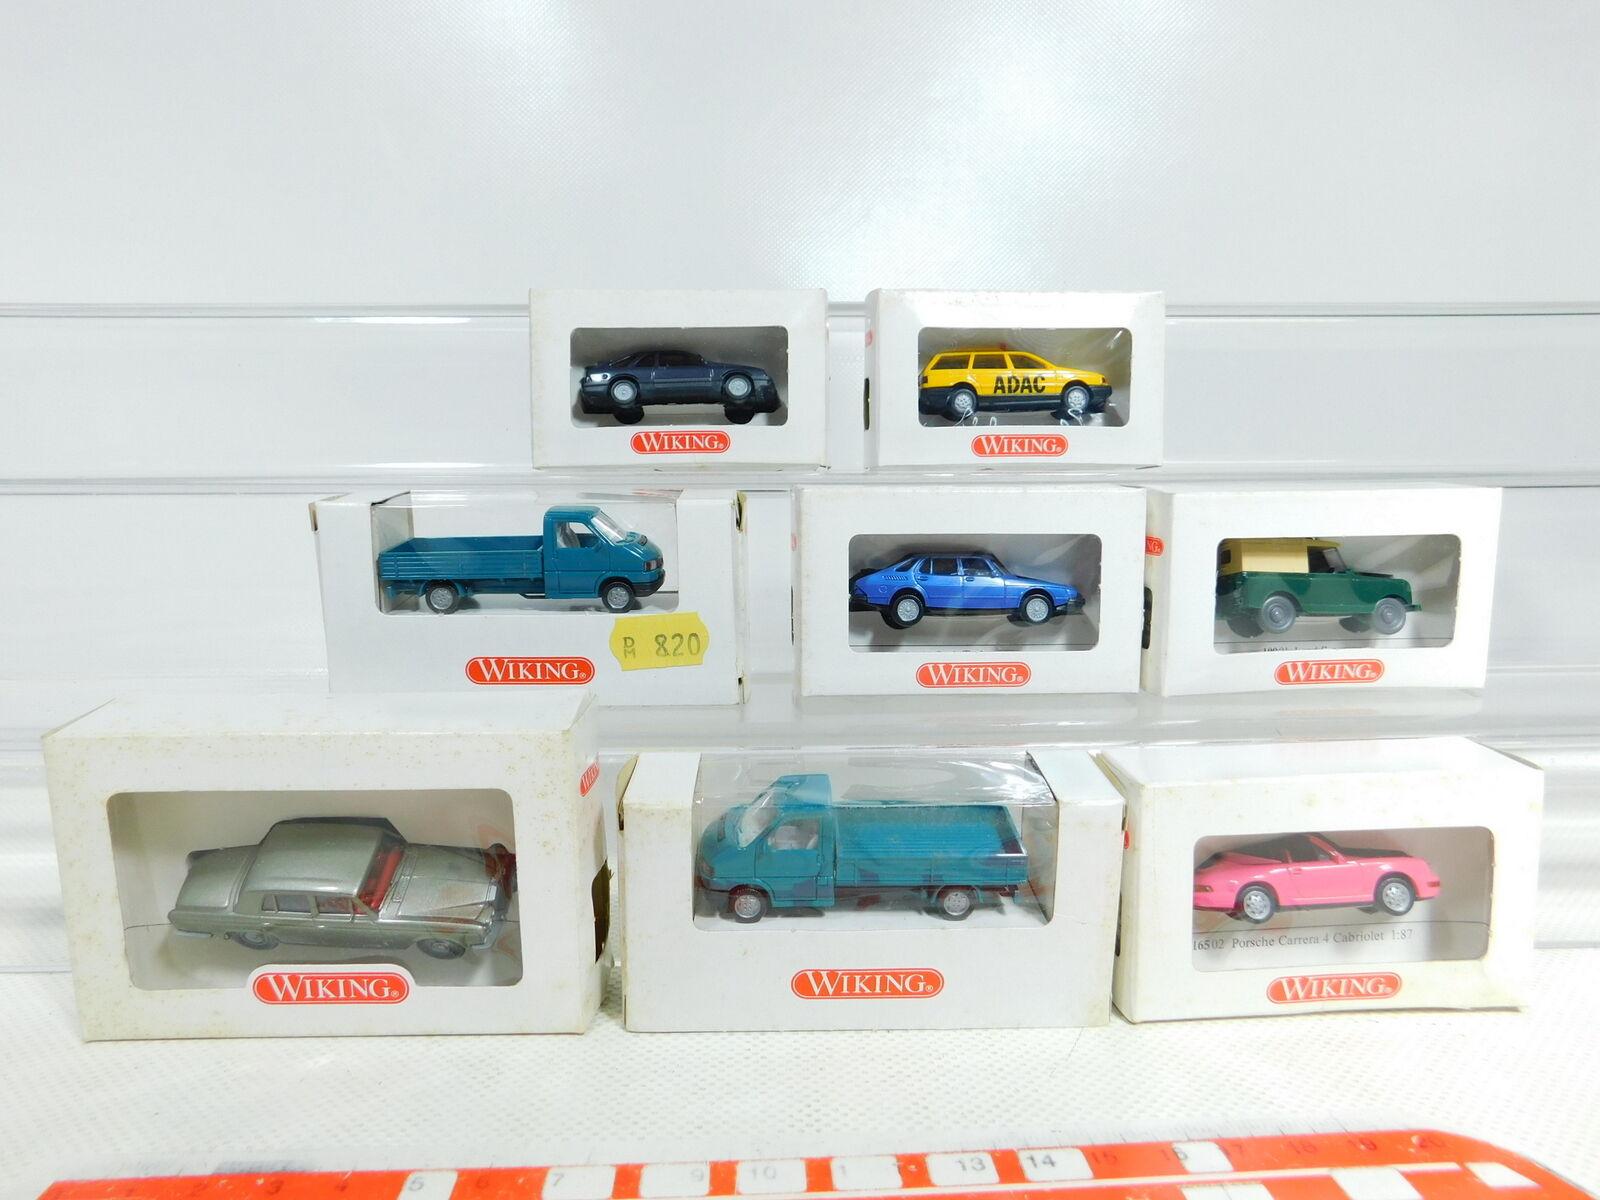 Bx363-0, 5  8x Wiking 1 87 h0 Modèle  100 Land Rover  165 porsche etc, Neuw  neuf dans sa boîte